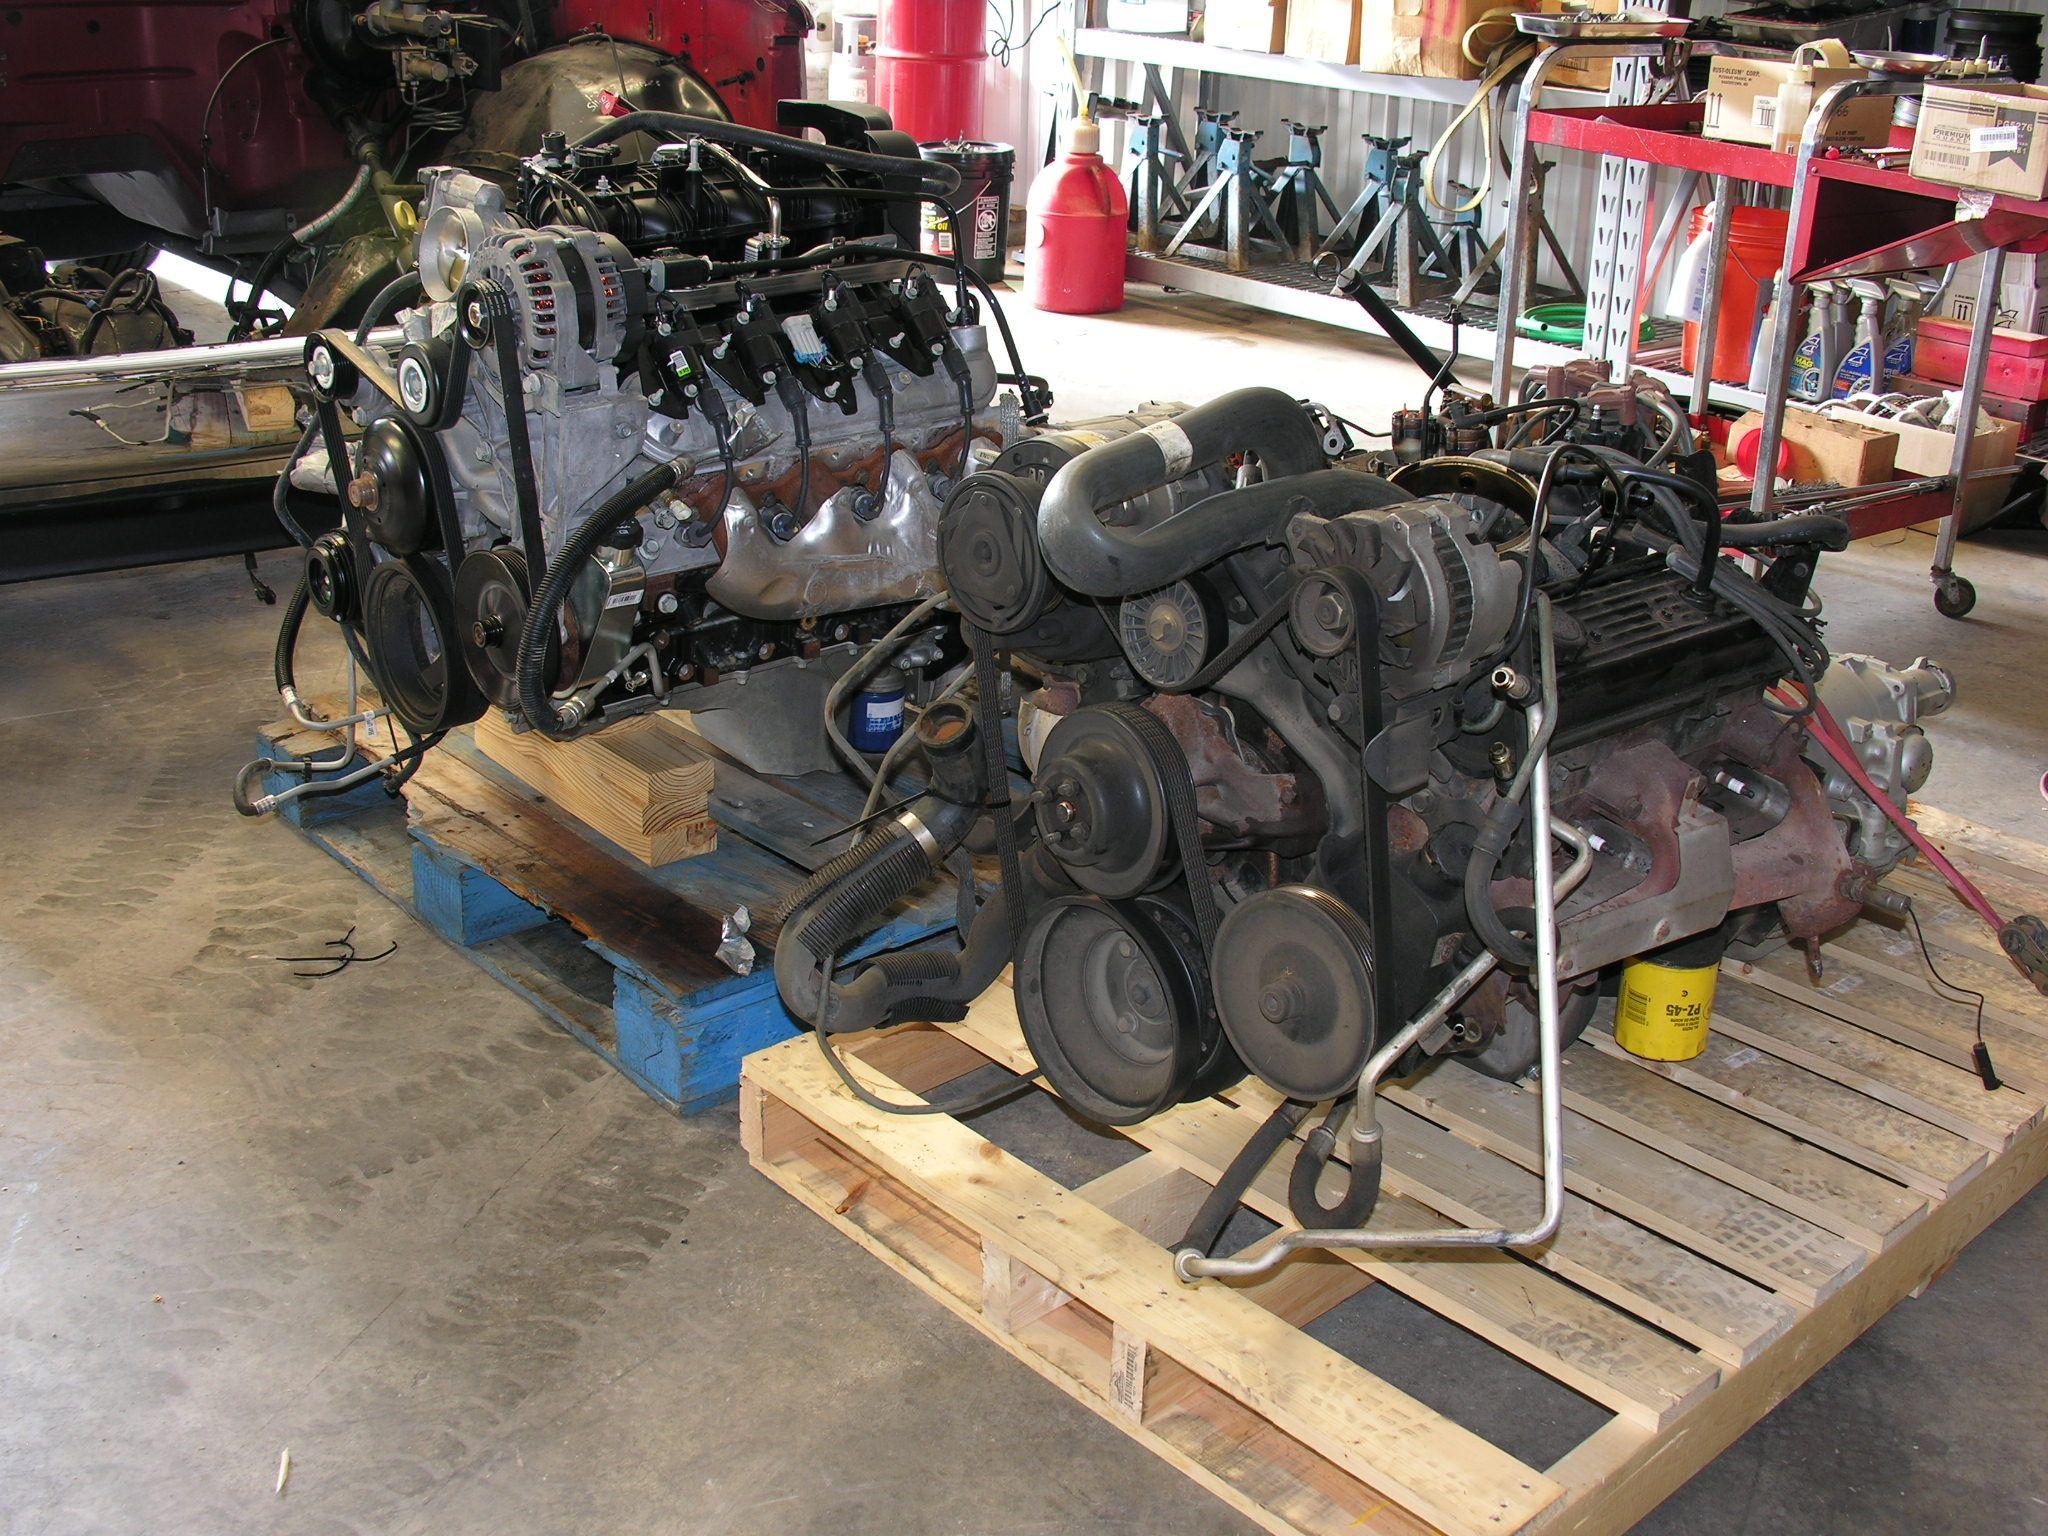 1989 Chevy Truck Conversion - 350 SBC to 5 3L Vortec Engine